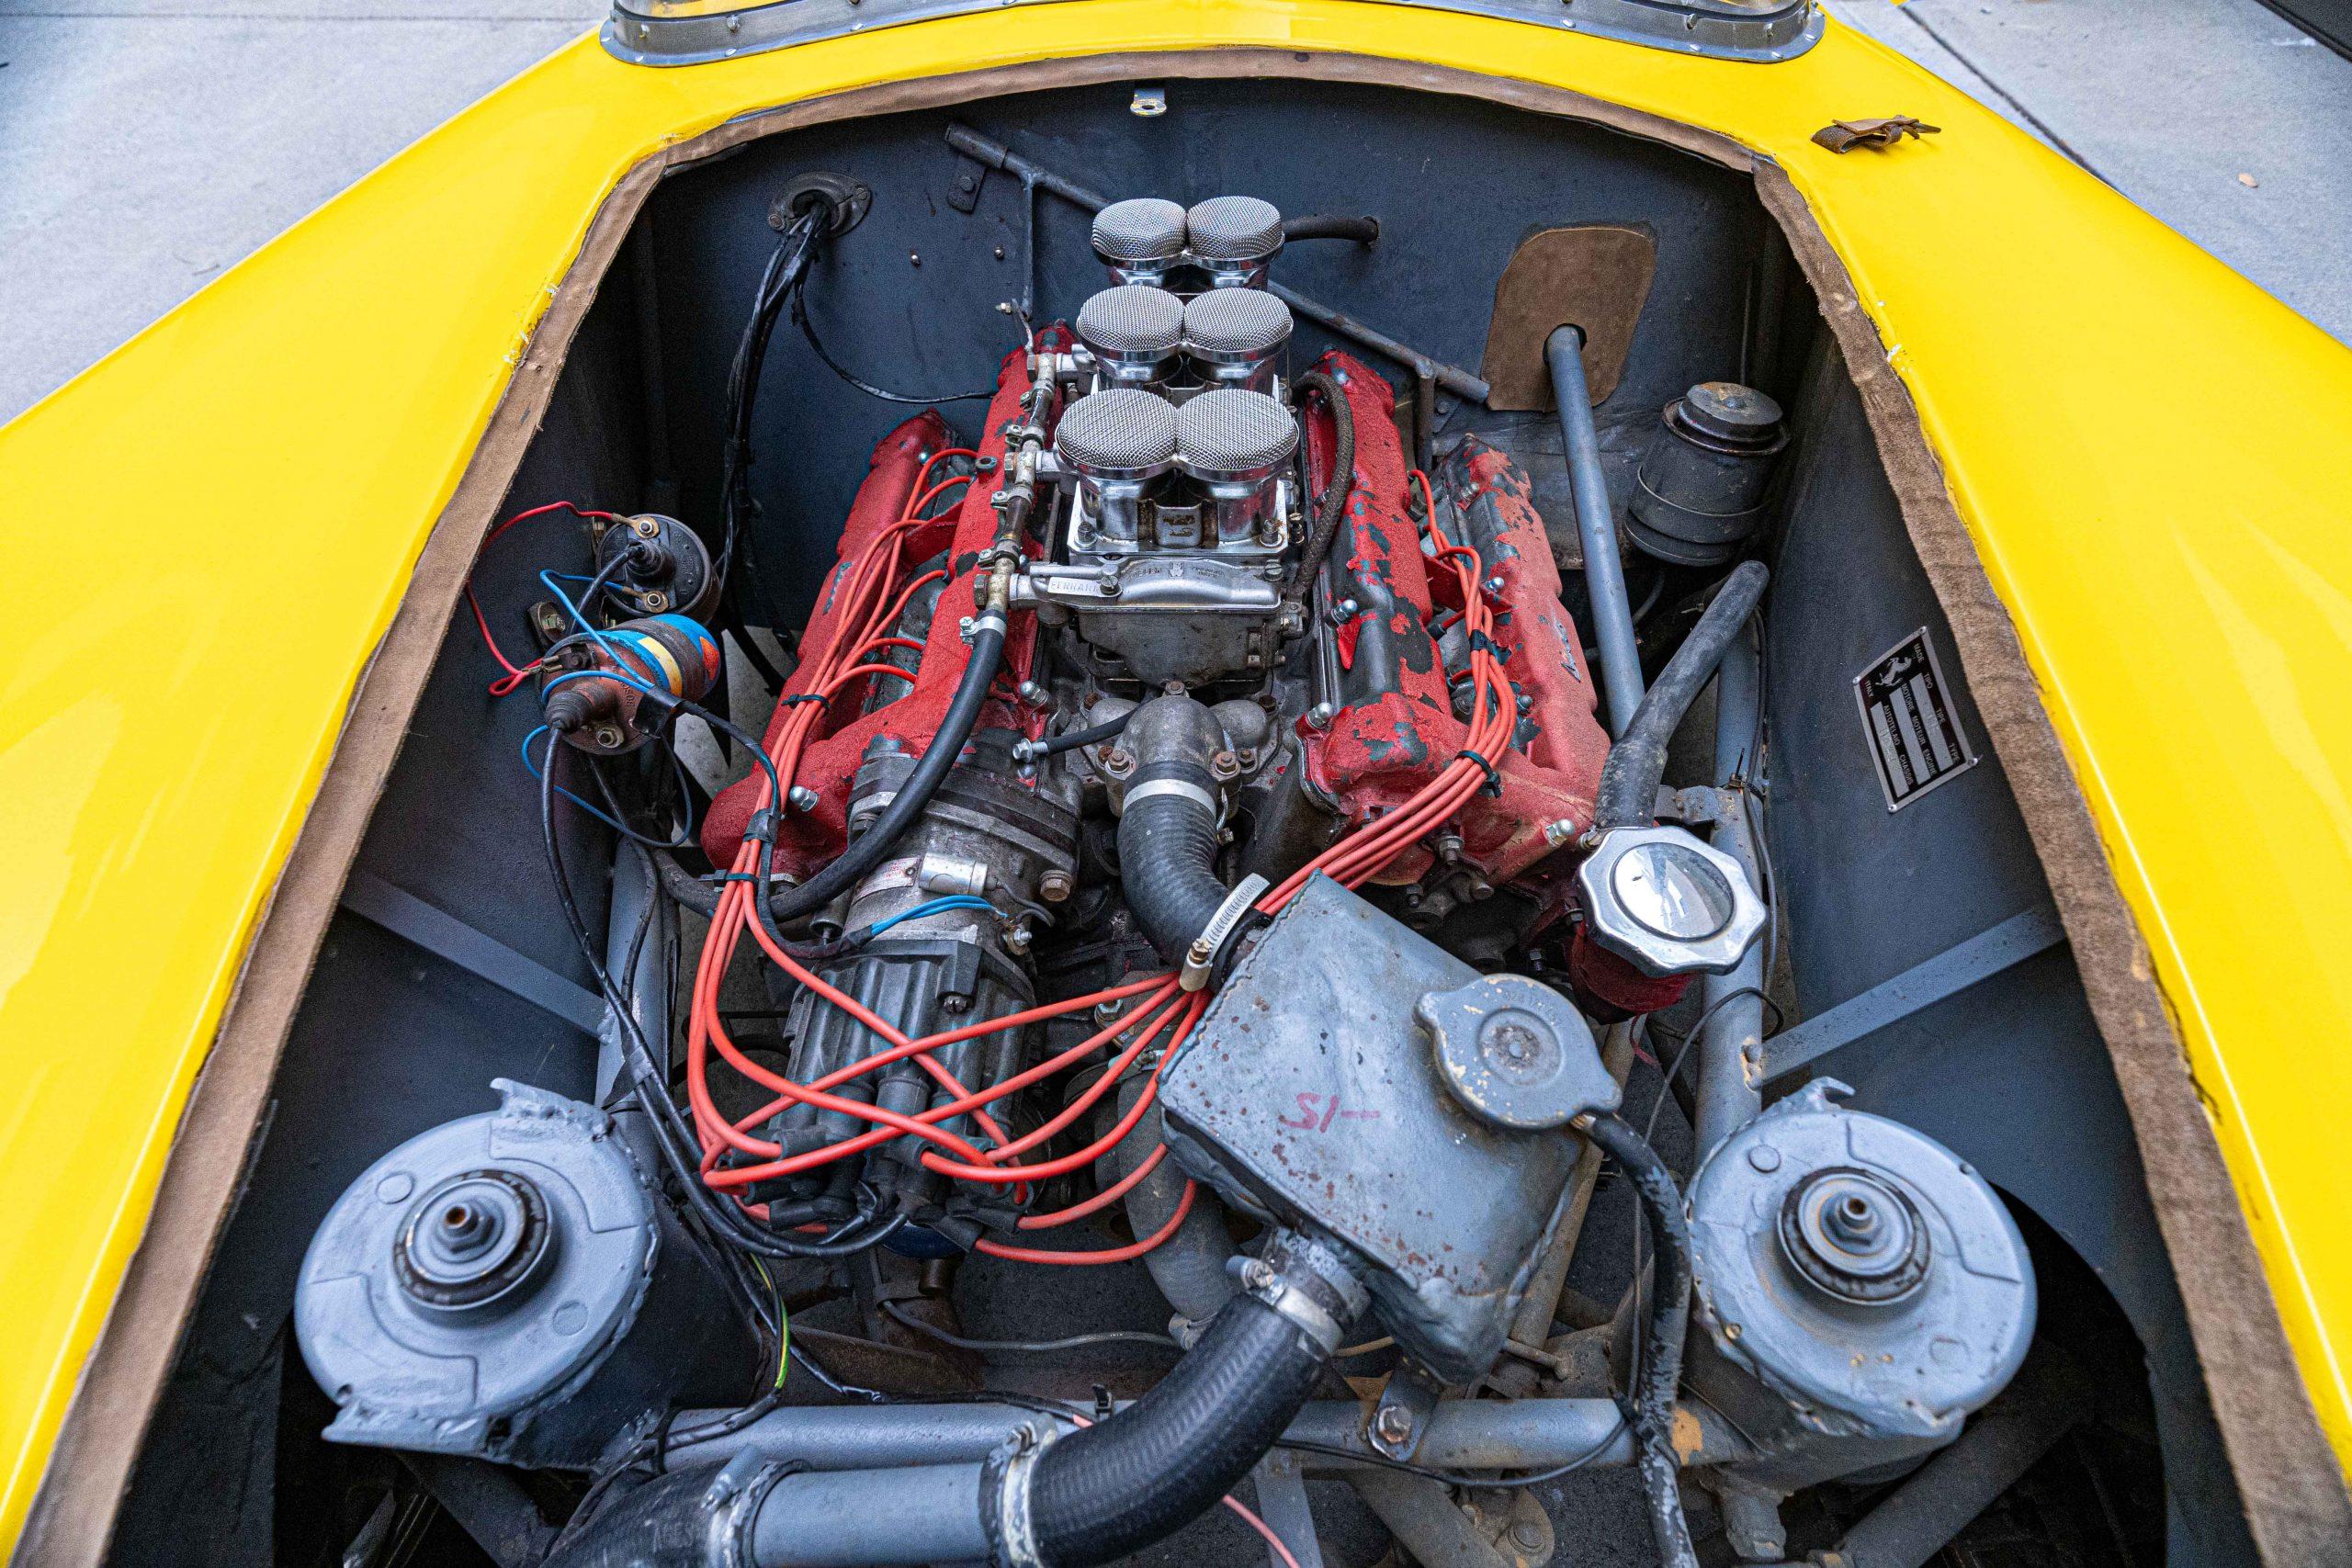 1957 Ferrari 196 SP Engine front view